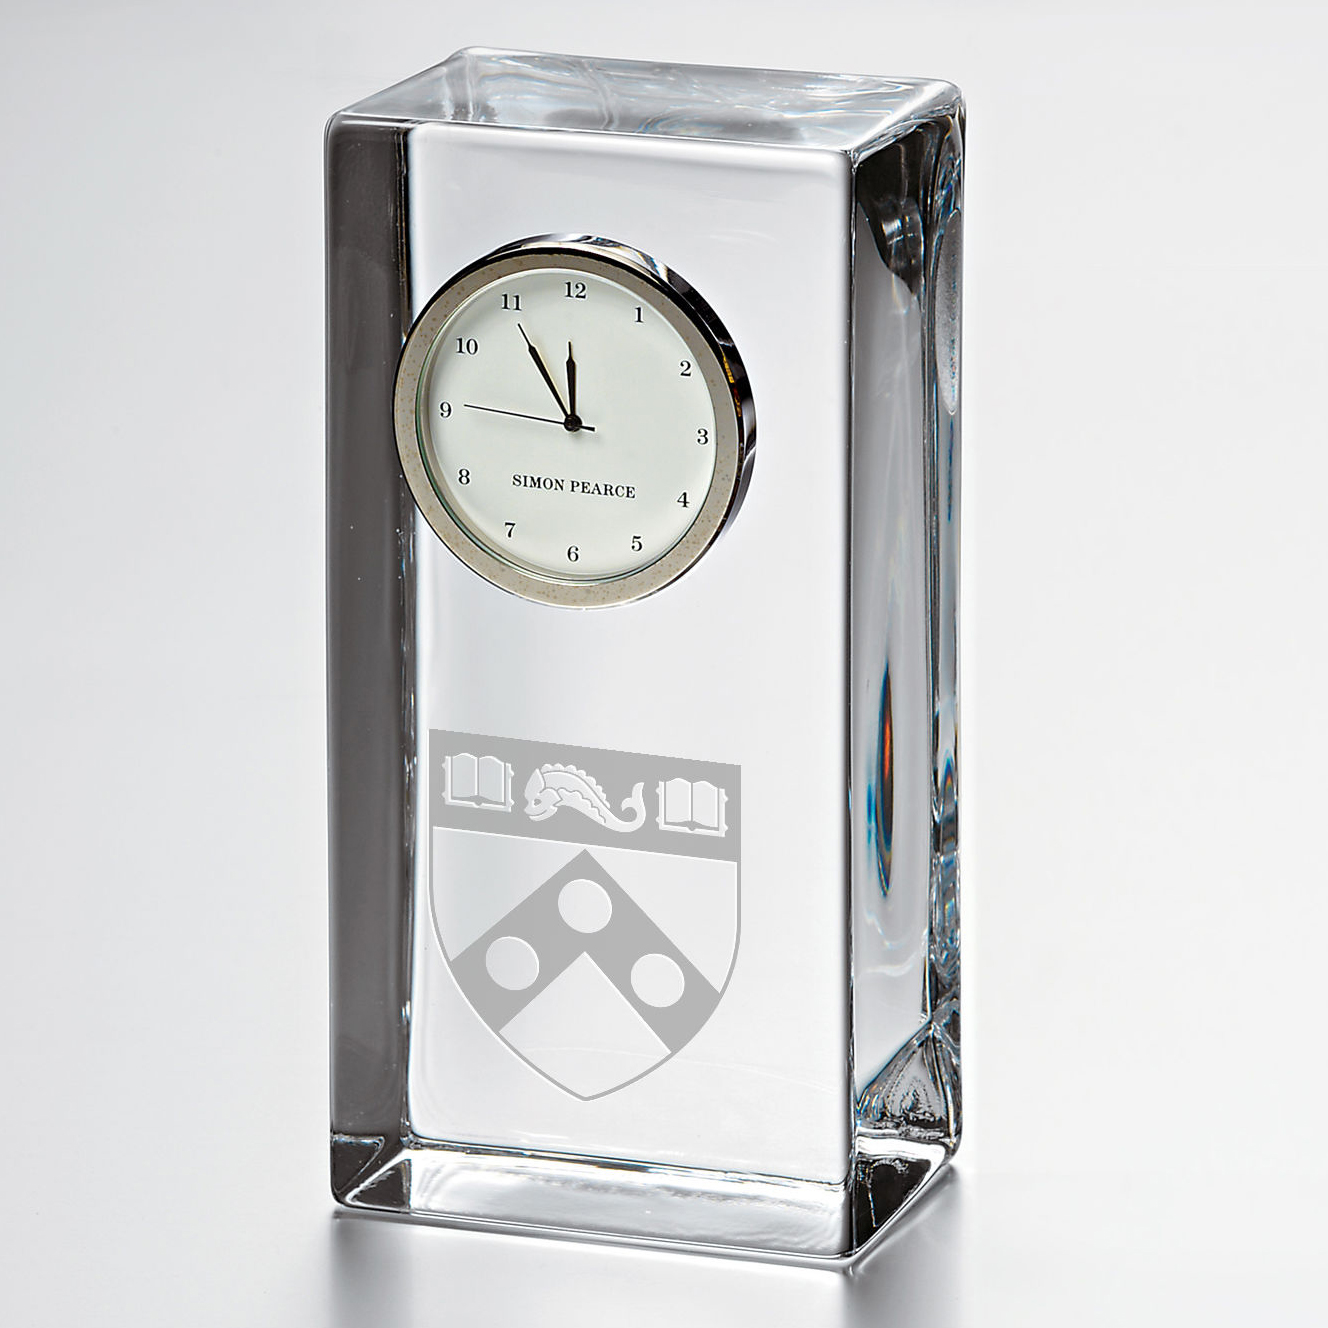 Penn Tall Glass Desk Clock by Simon Pearce